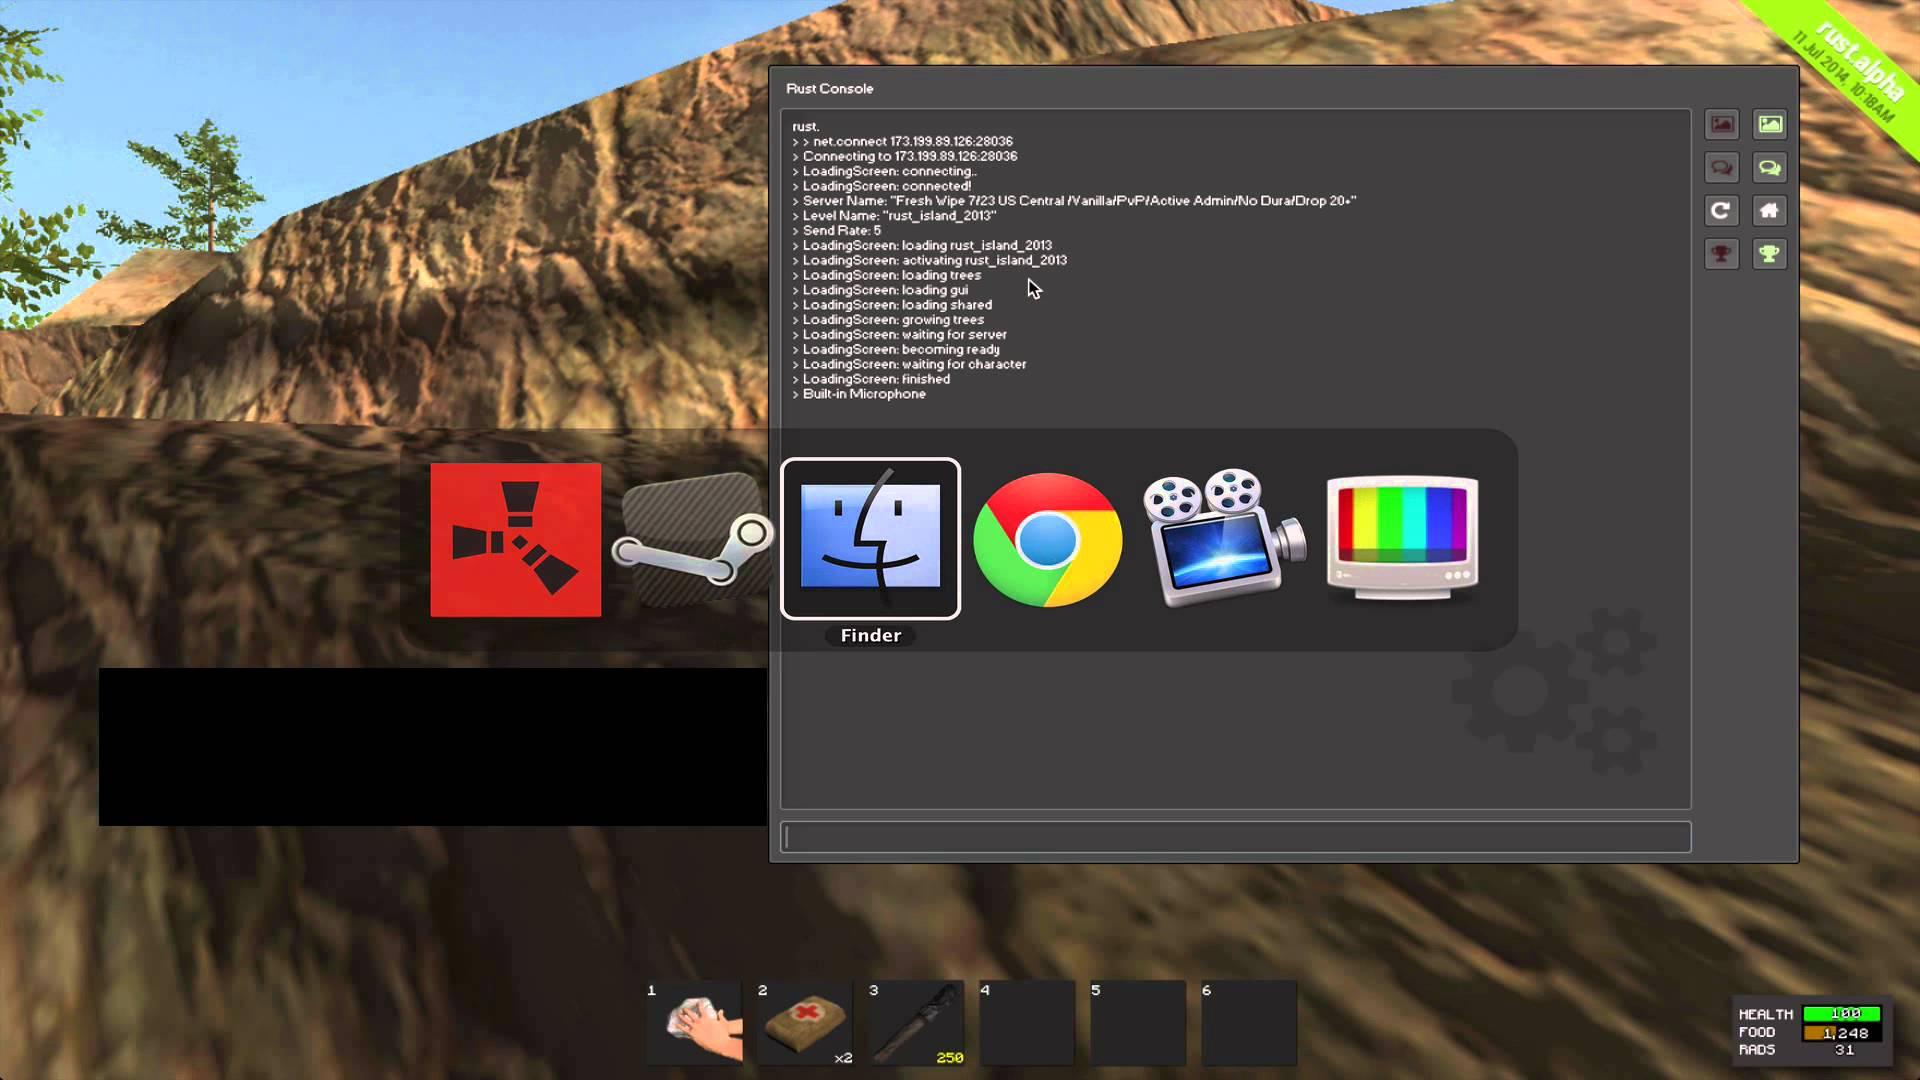 rust game not working on mac